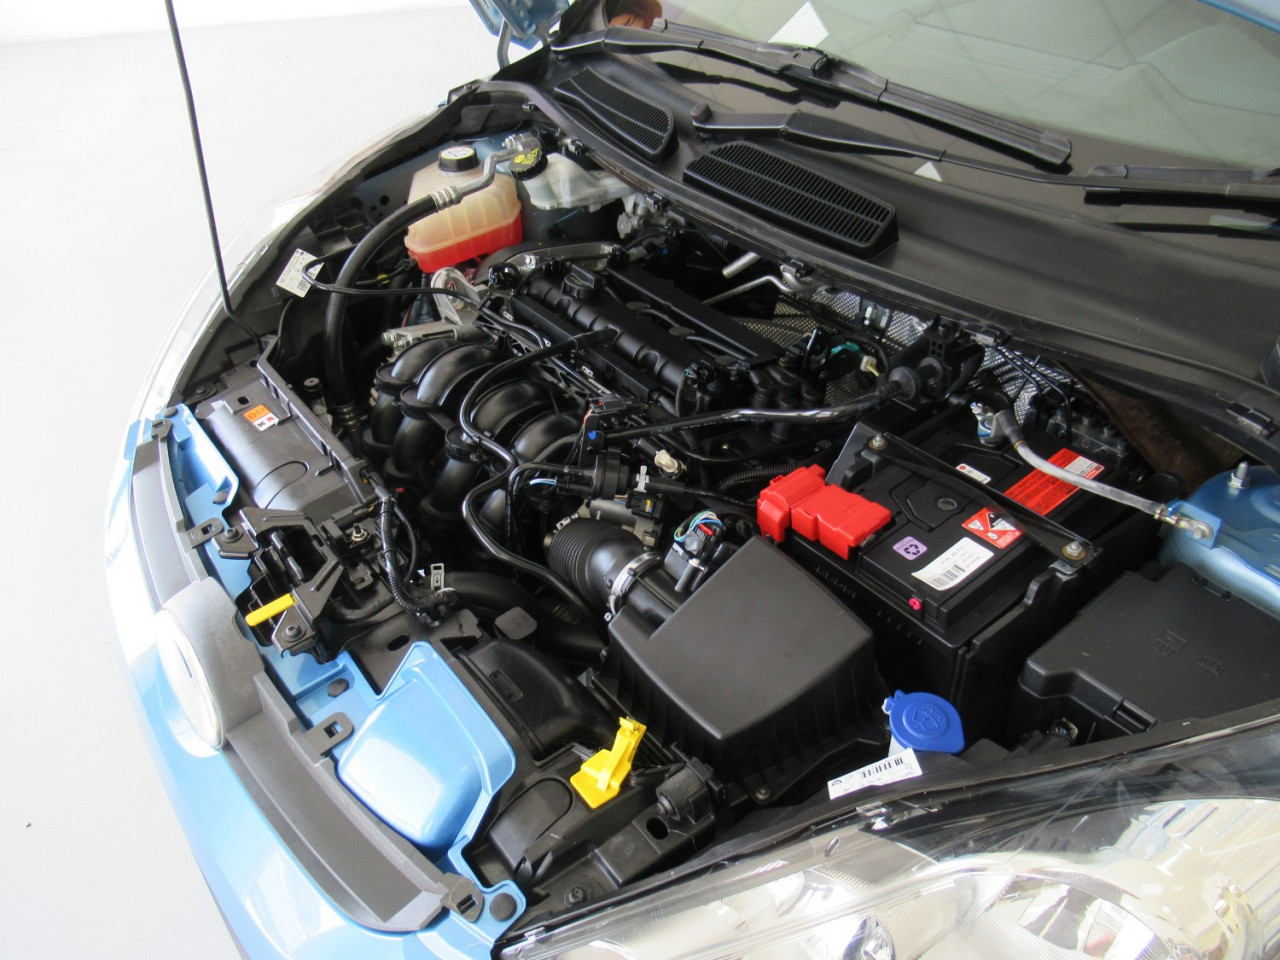 2009 Ford Fiesta WS CL Hatchback Image 25